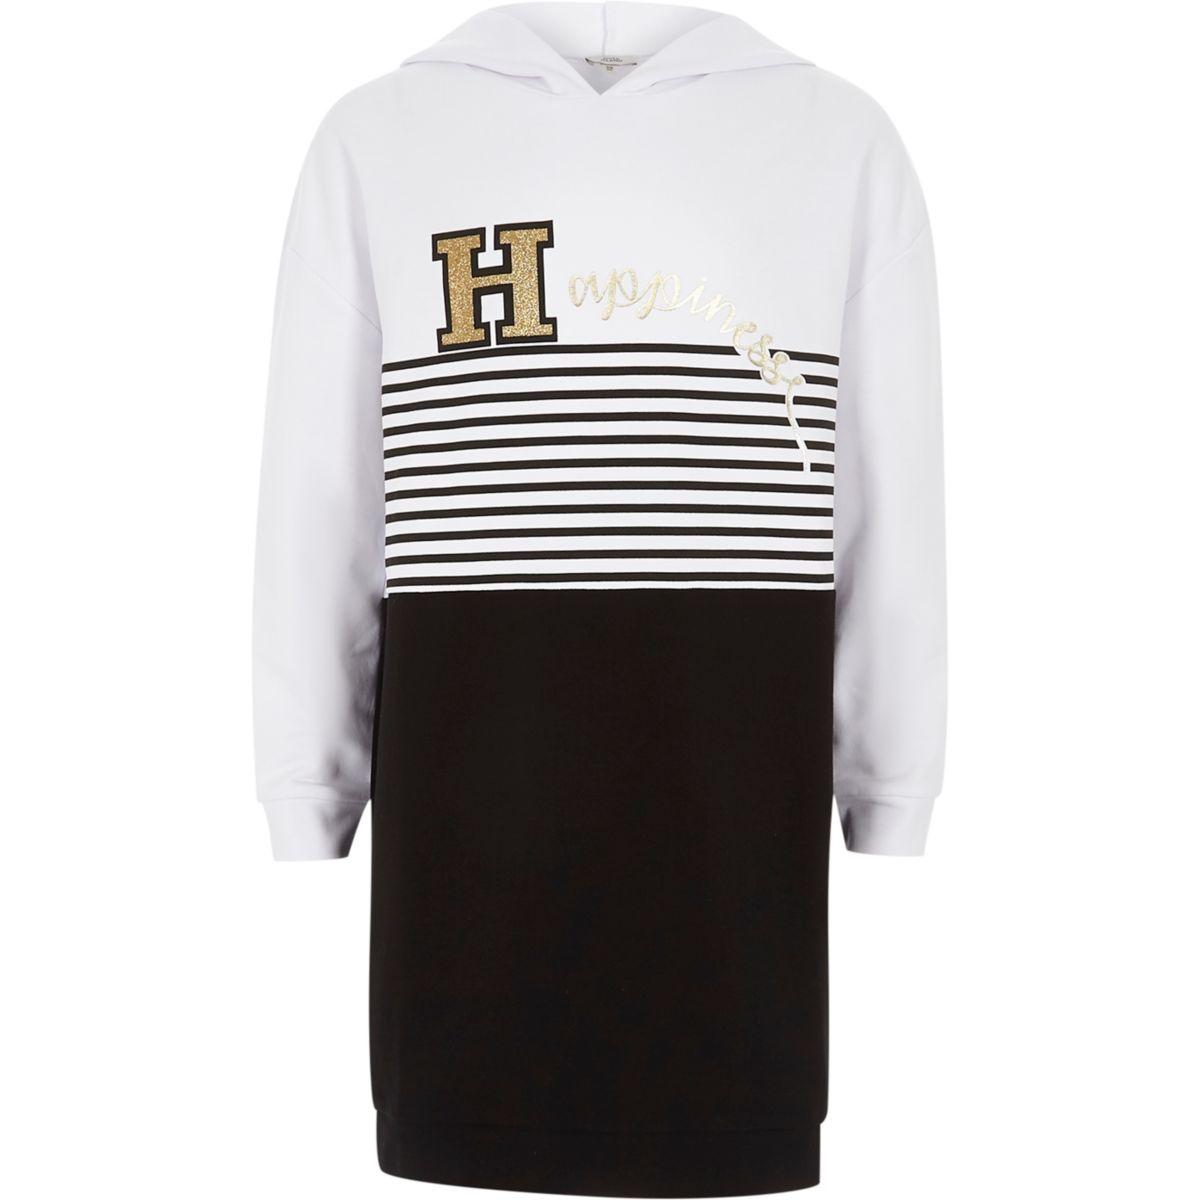 Girls black stripe 'happiness' hoodie dress